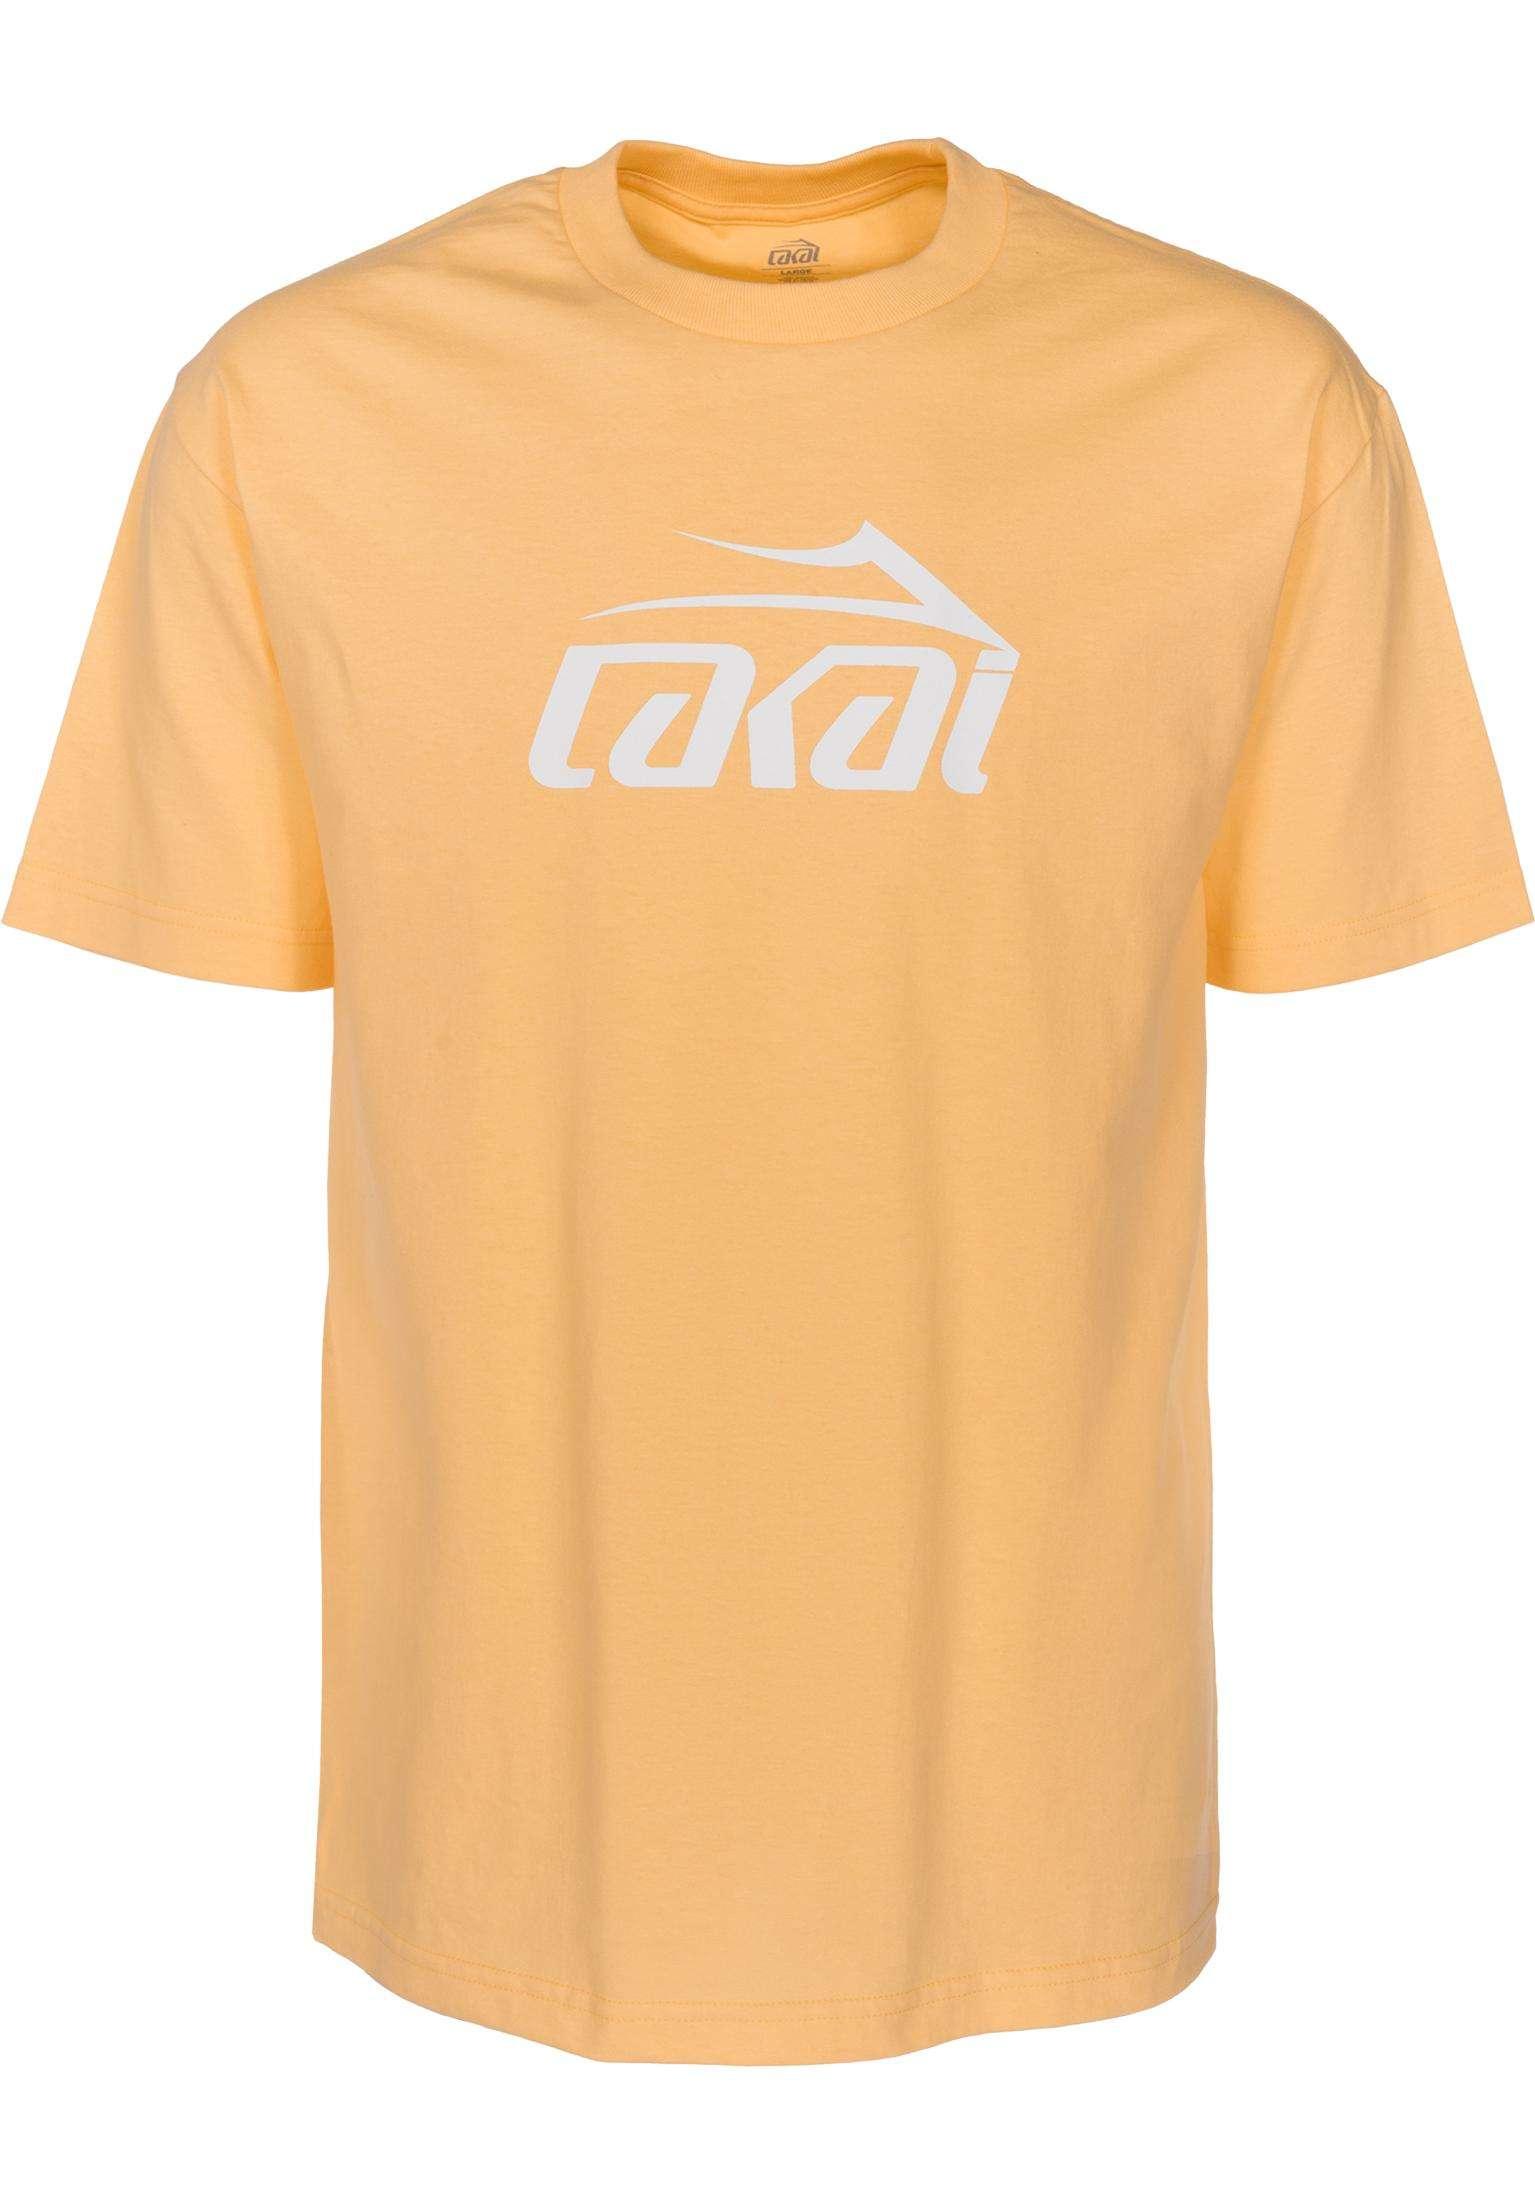 b03b3552b6 Basic Lakai T-Shirts in squash for Men